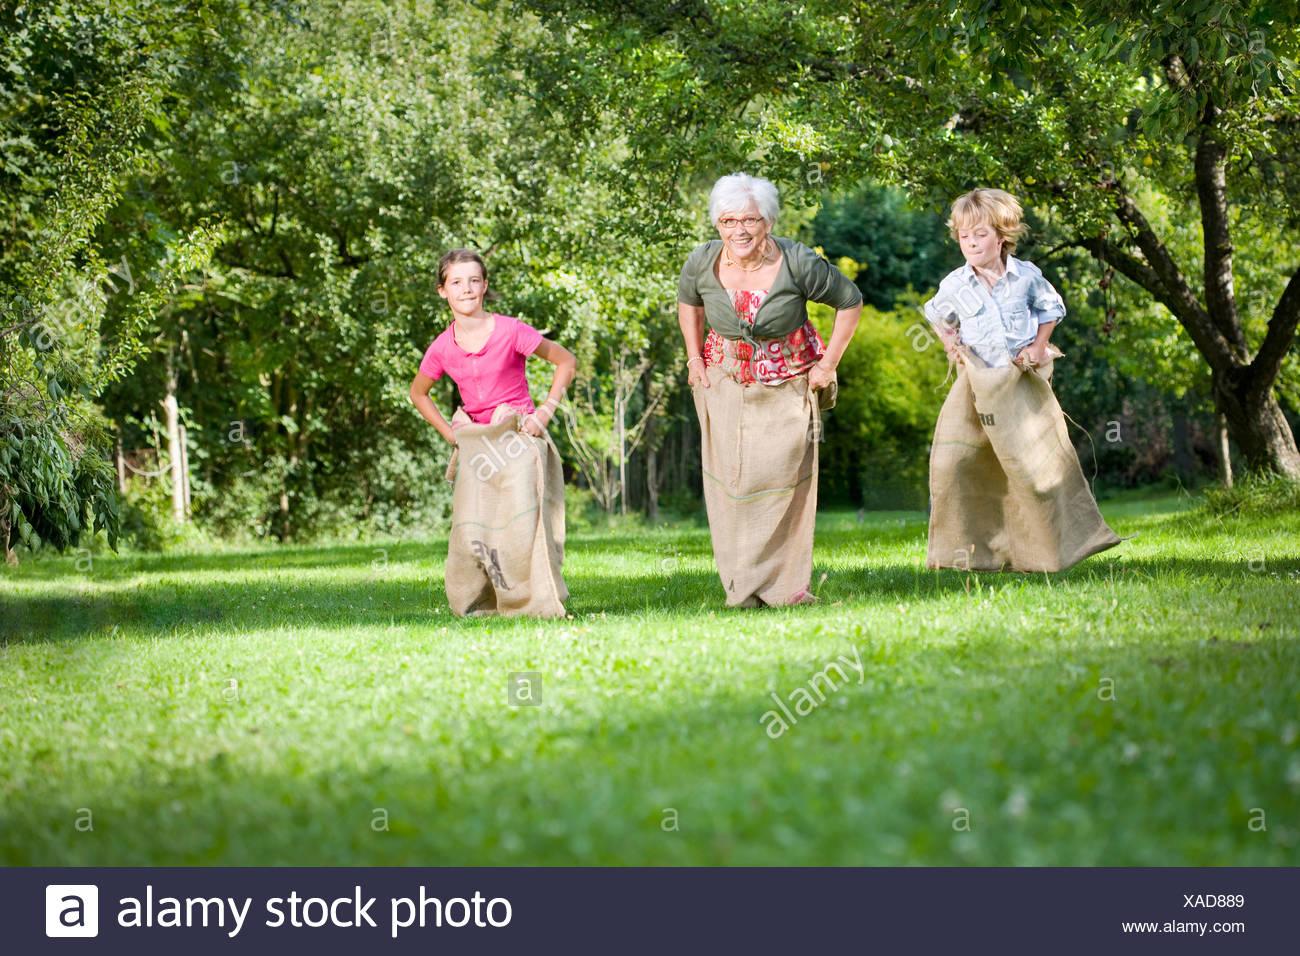 Children sack racing with grandmother - Stock Image